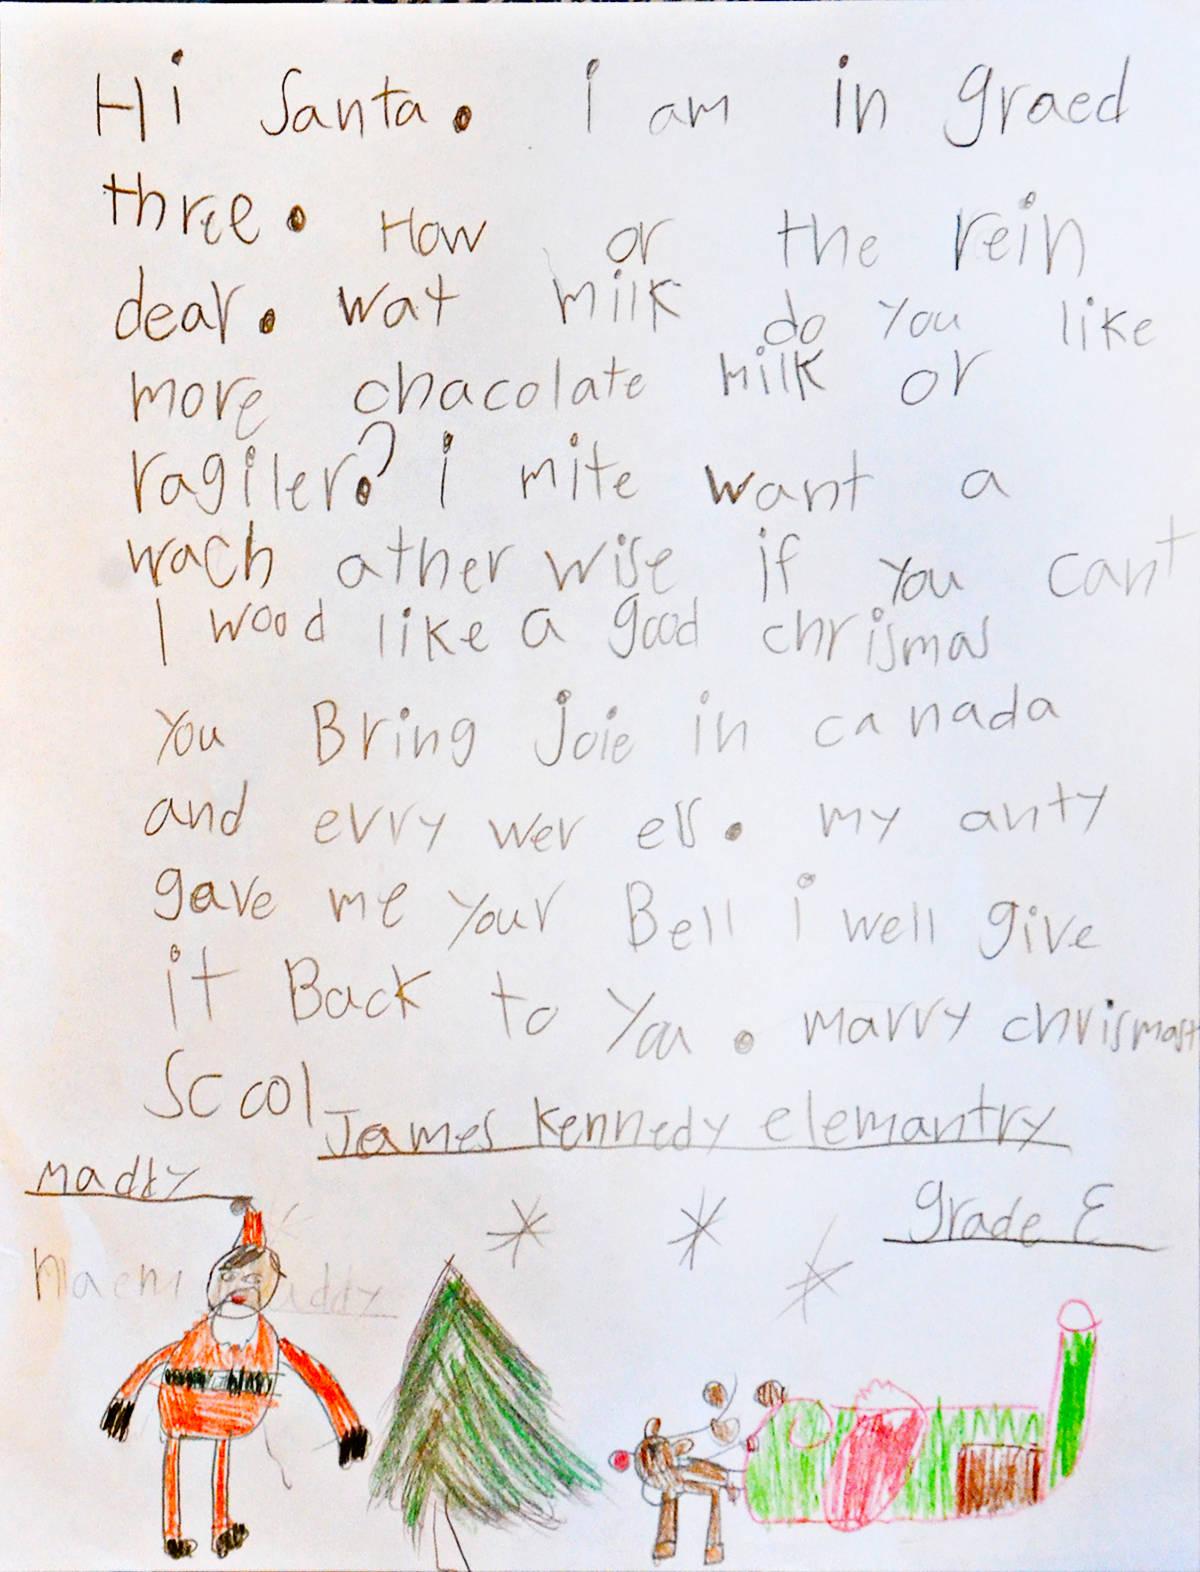 Maddy, Grade 3, James Kennedy Elementary